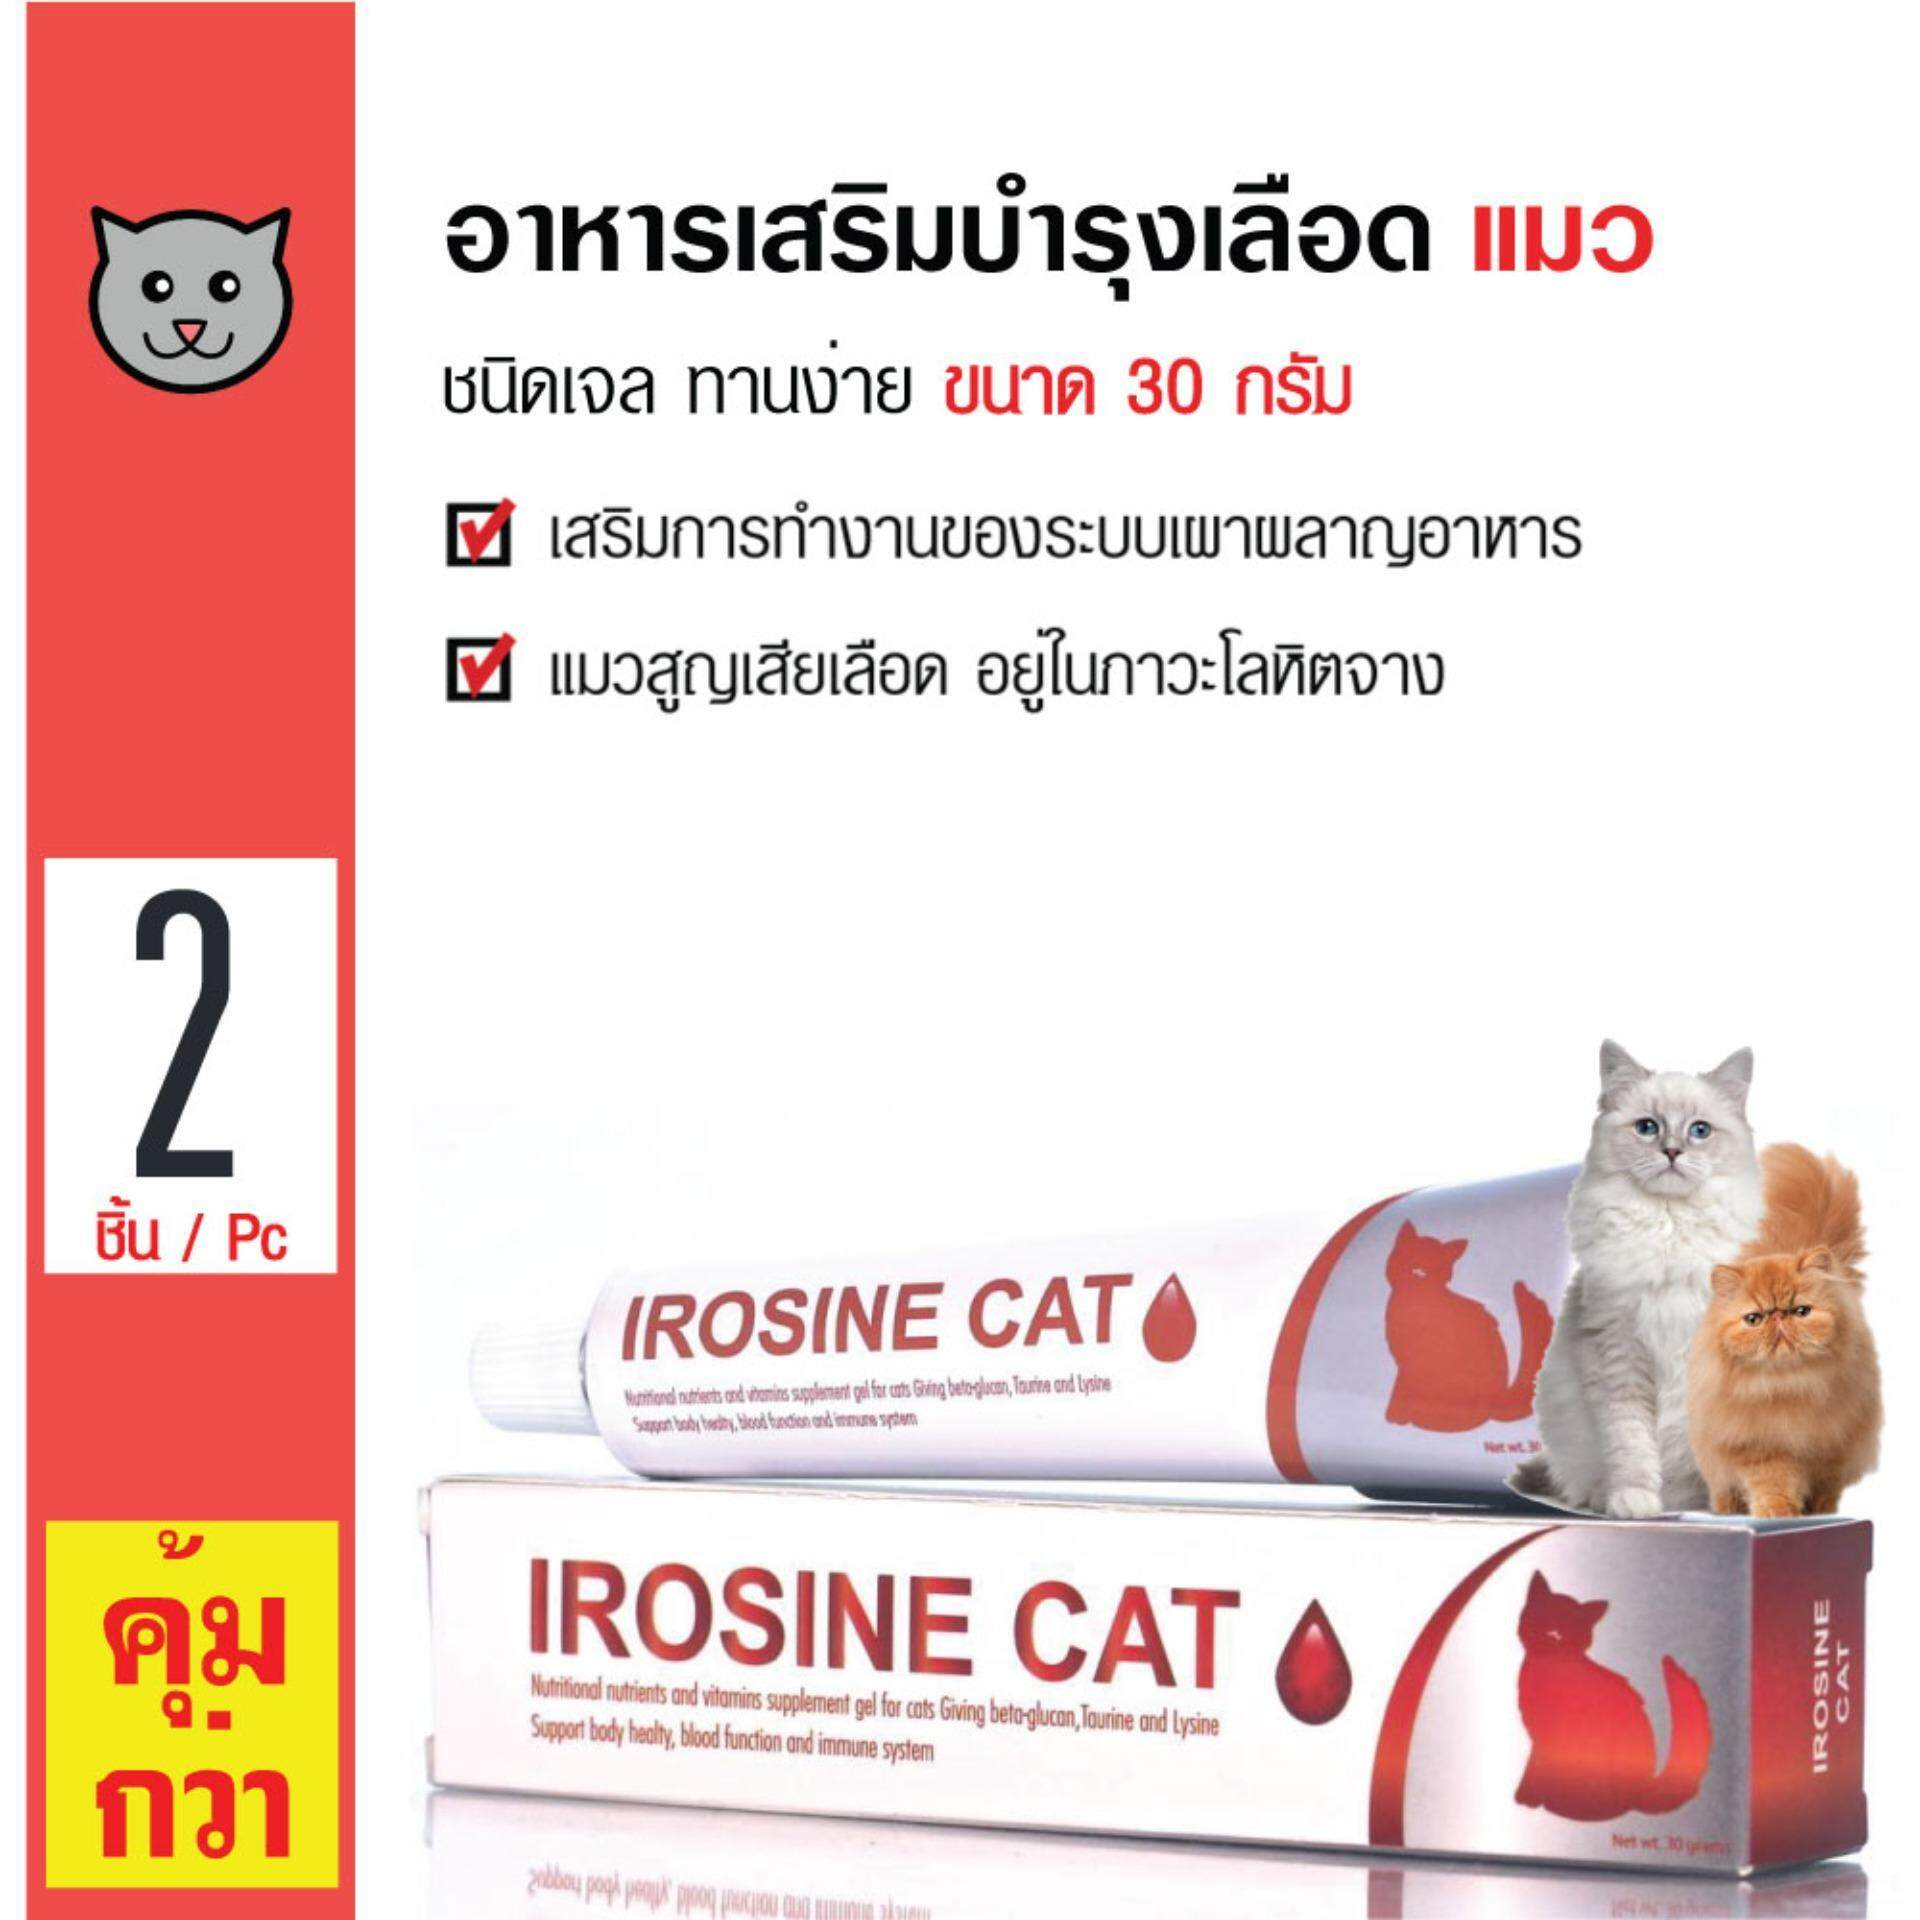 Irosine อาหารเสริมบำรุงเลือด สำหรับแมว แบบเจล 2หลอด ขนาด 30g